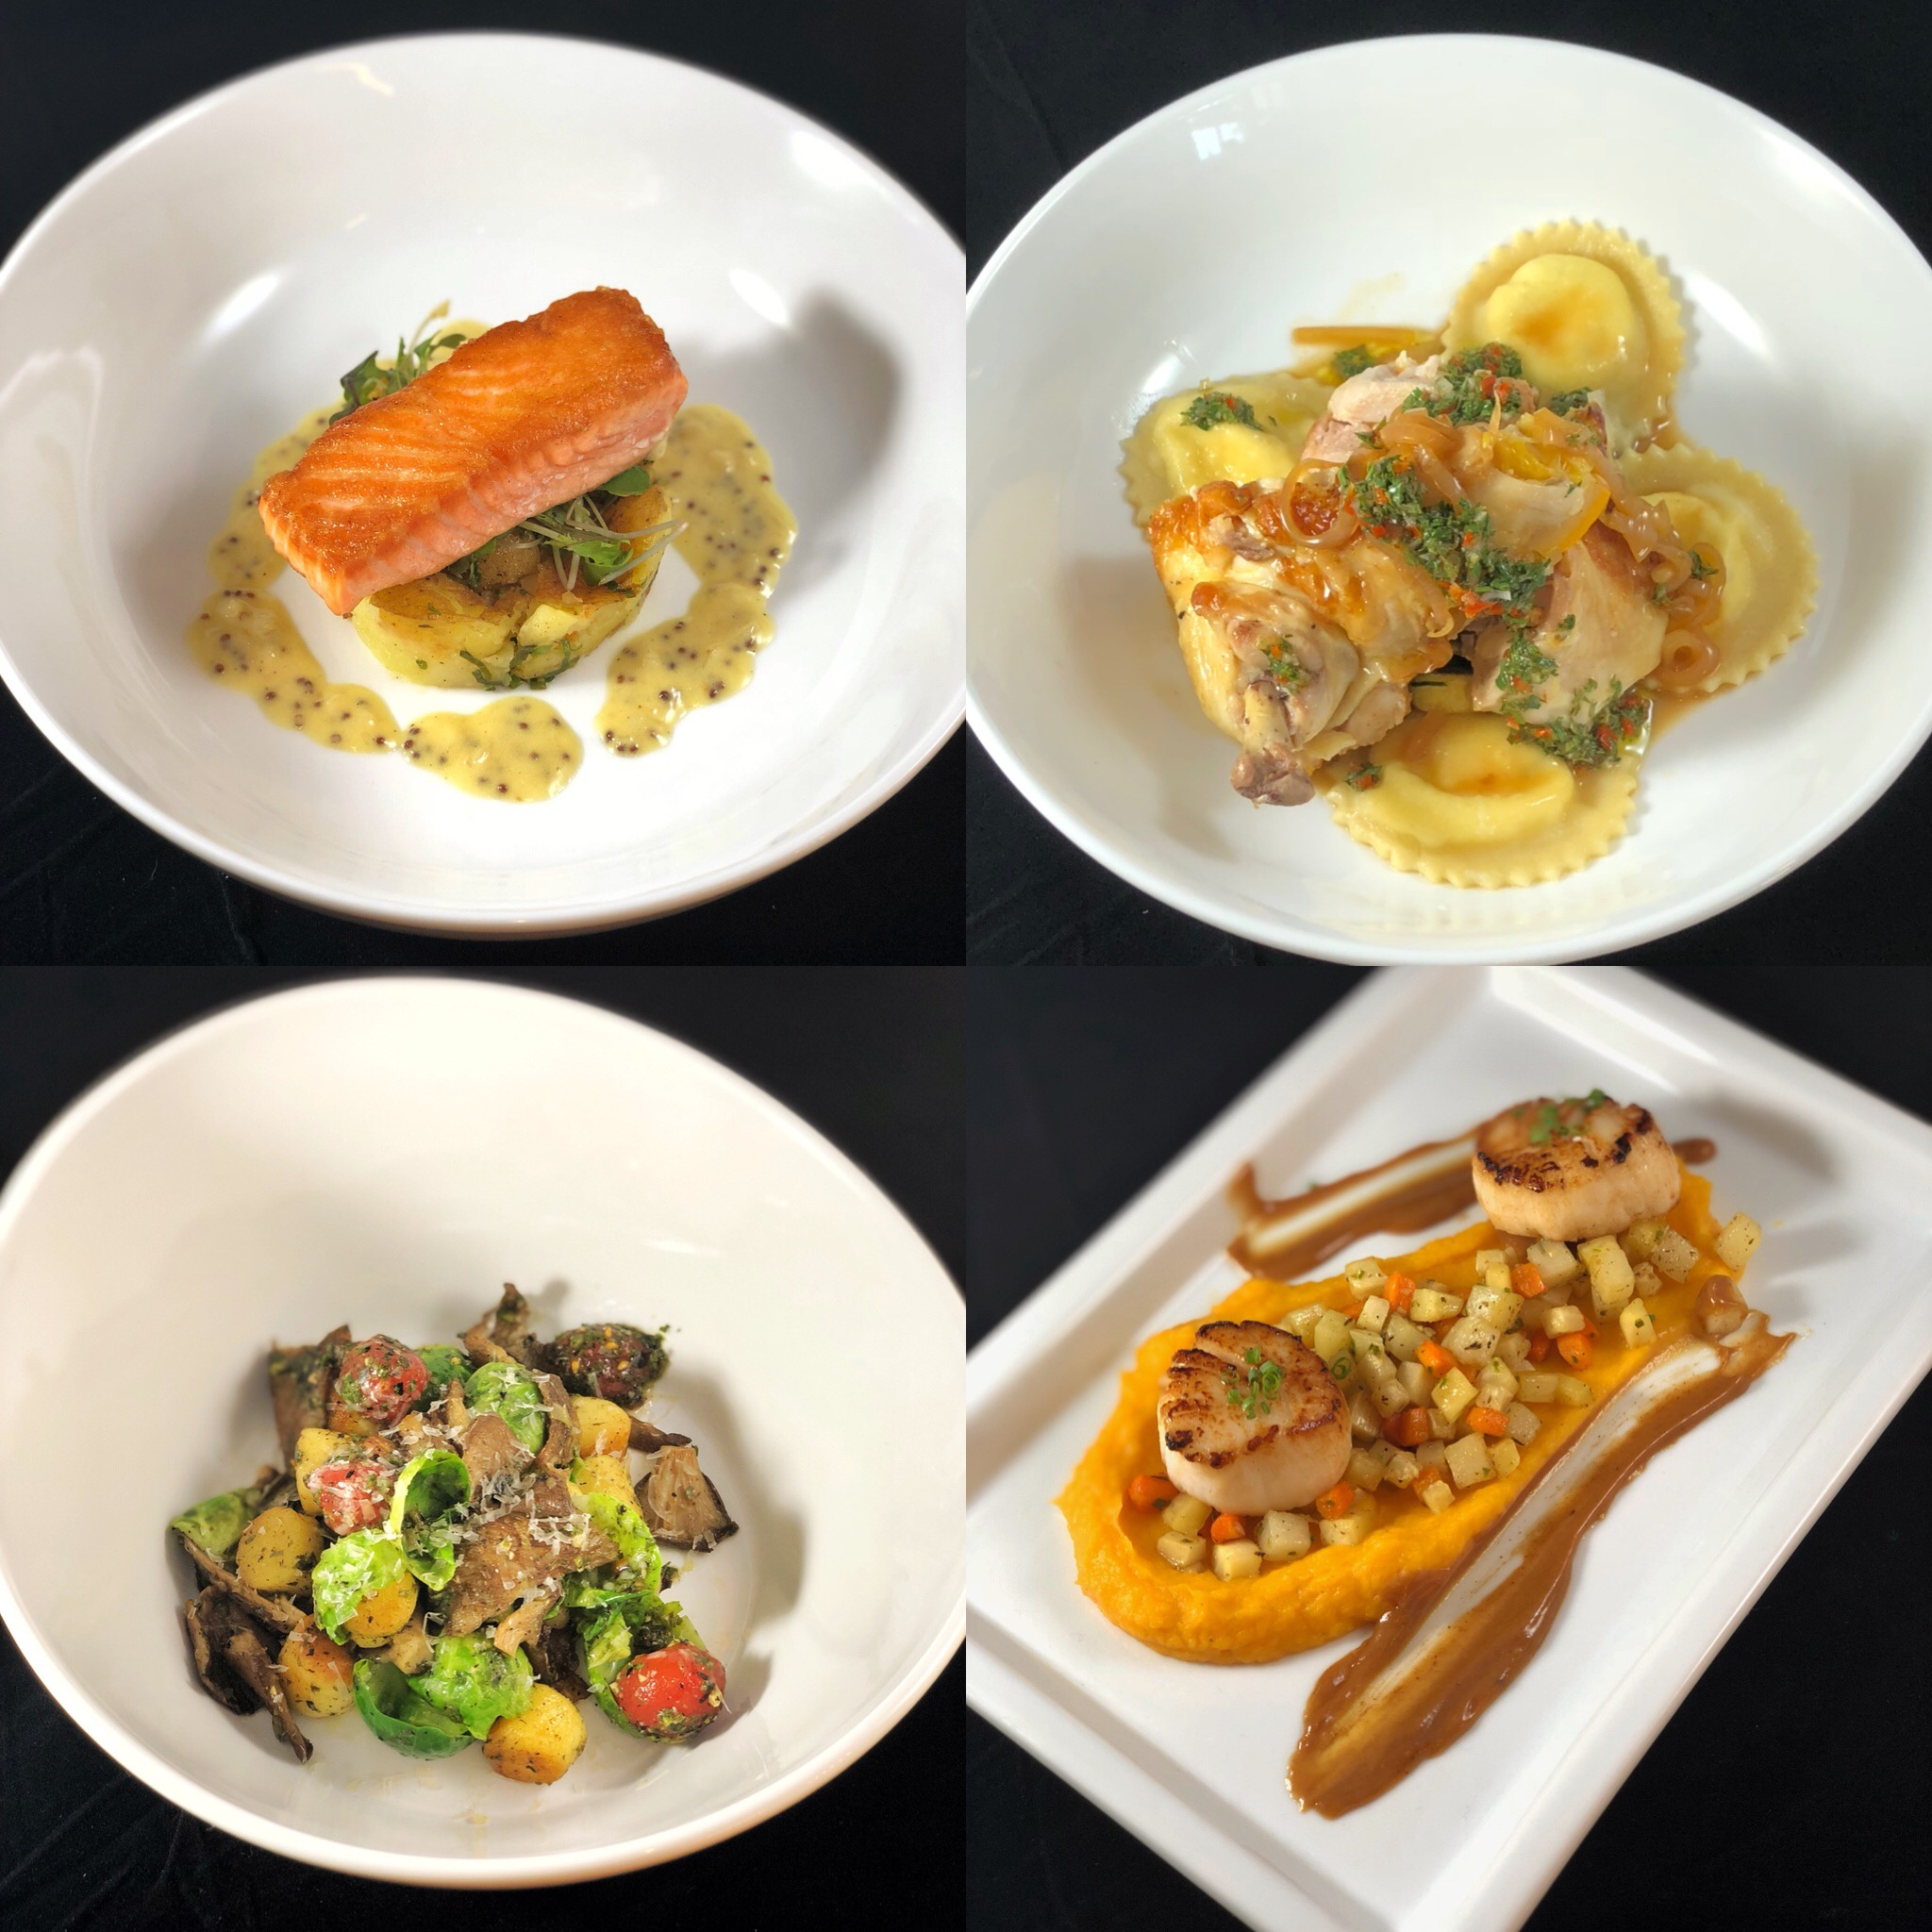 Salmon, lemon-basil potato & mustard cream. Ricotta ravioli & roasted chicken. Gnocchi, mushroom, brussels & scallion pesto. Scallops, butternut squash, root vegetable hash & browned butter.